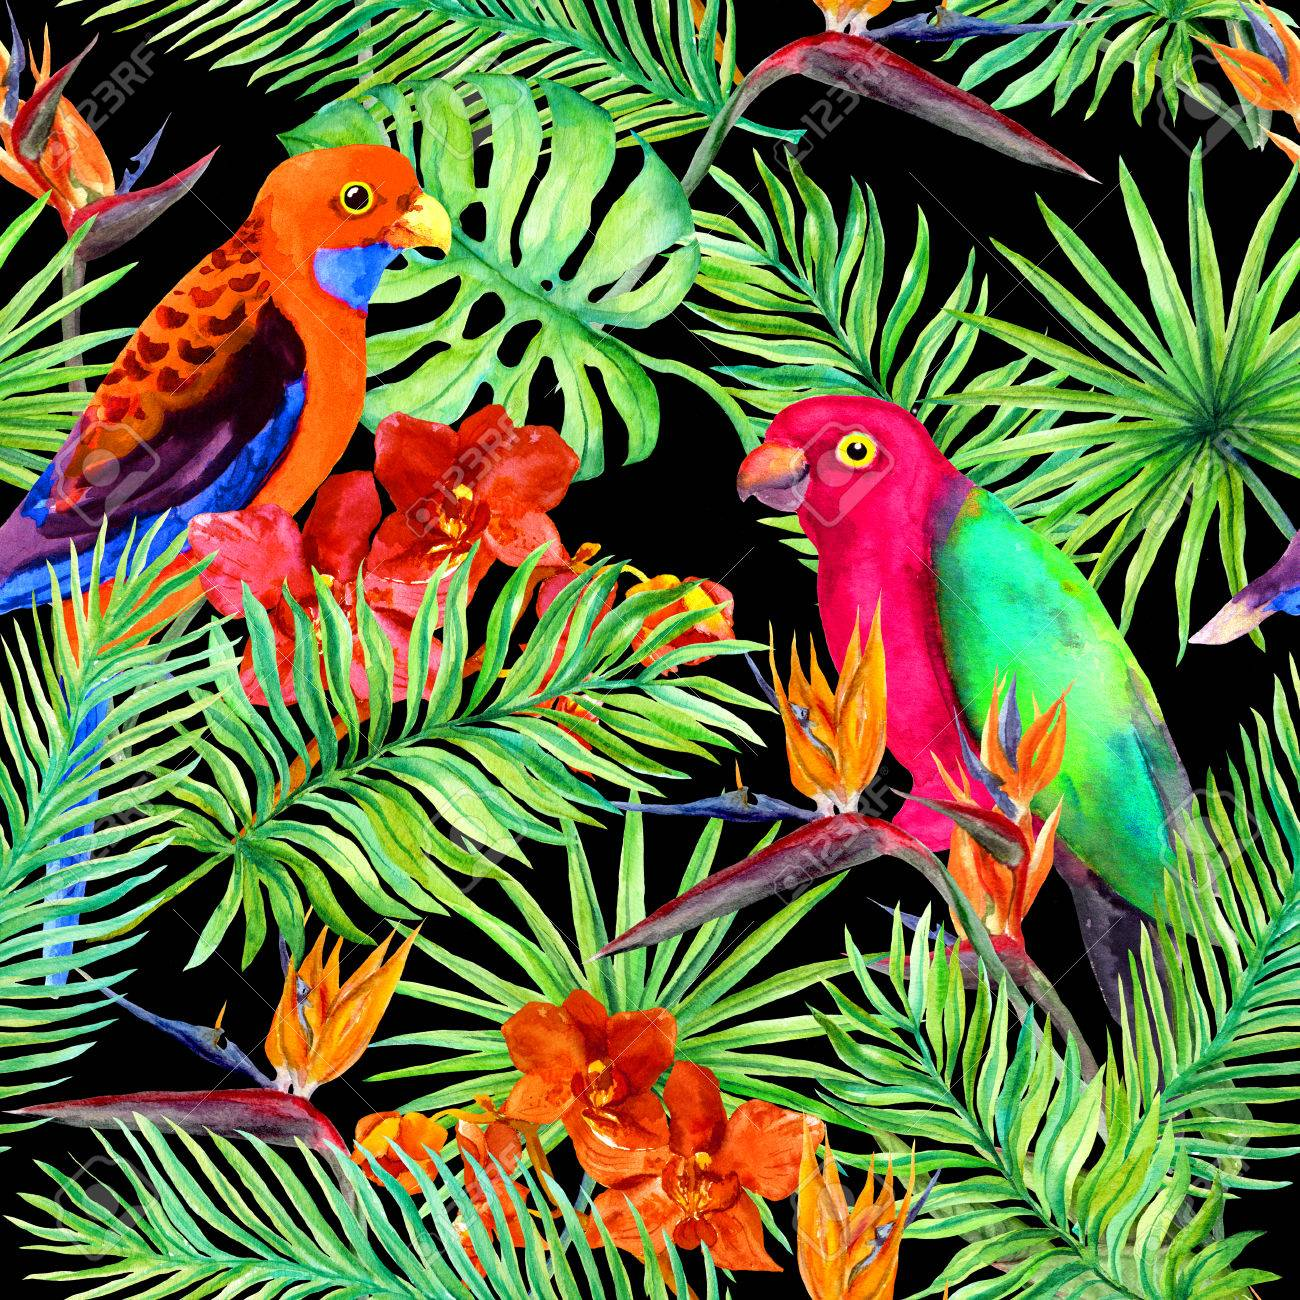 Jungle Leaves Parrots Butterflies Multicolored Feature Wallpaper